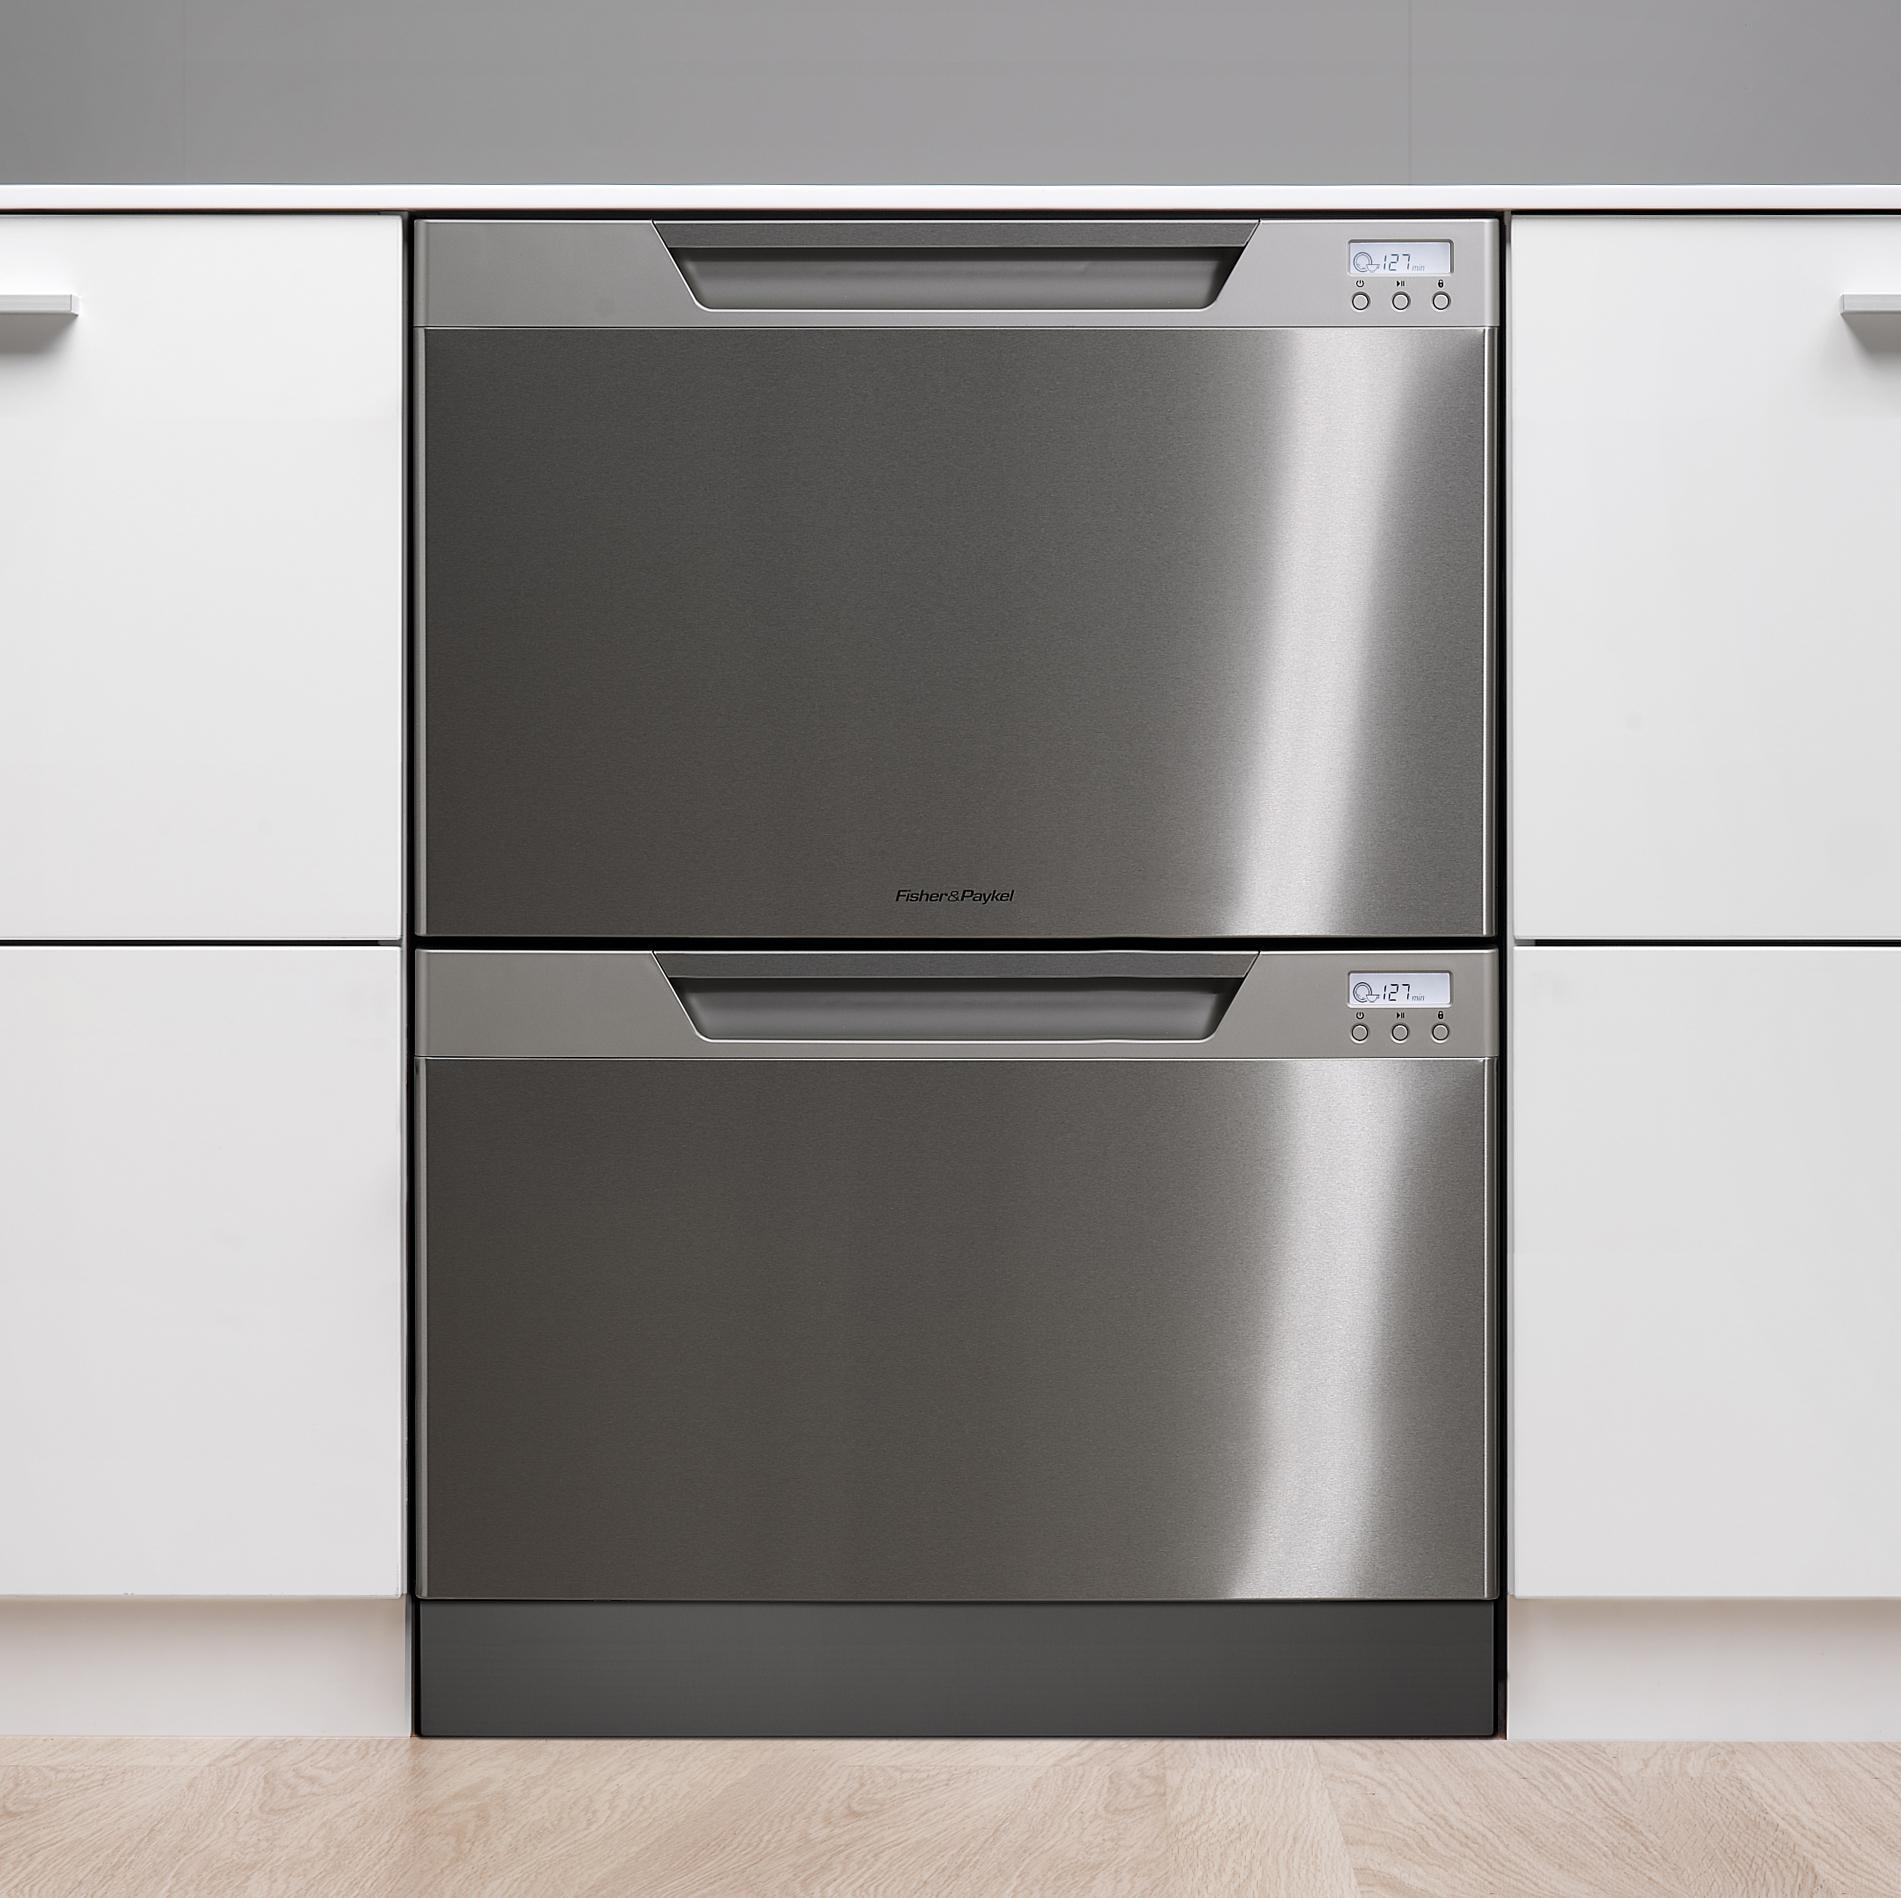 Appliance Repair Authorized Appliance Repair